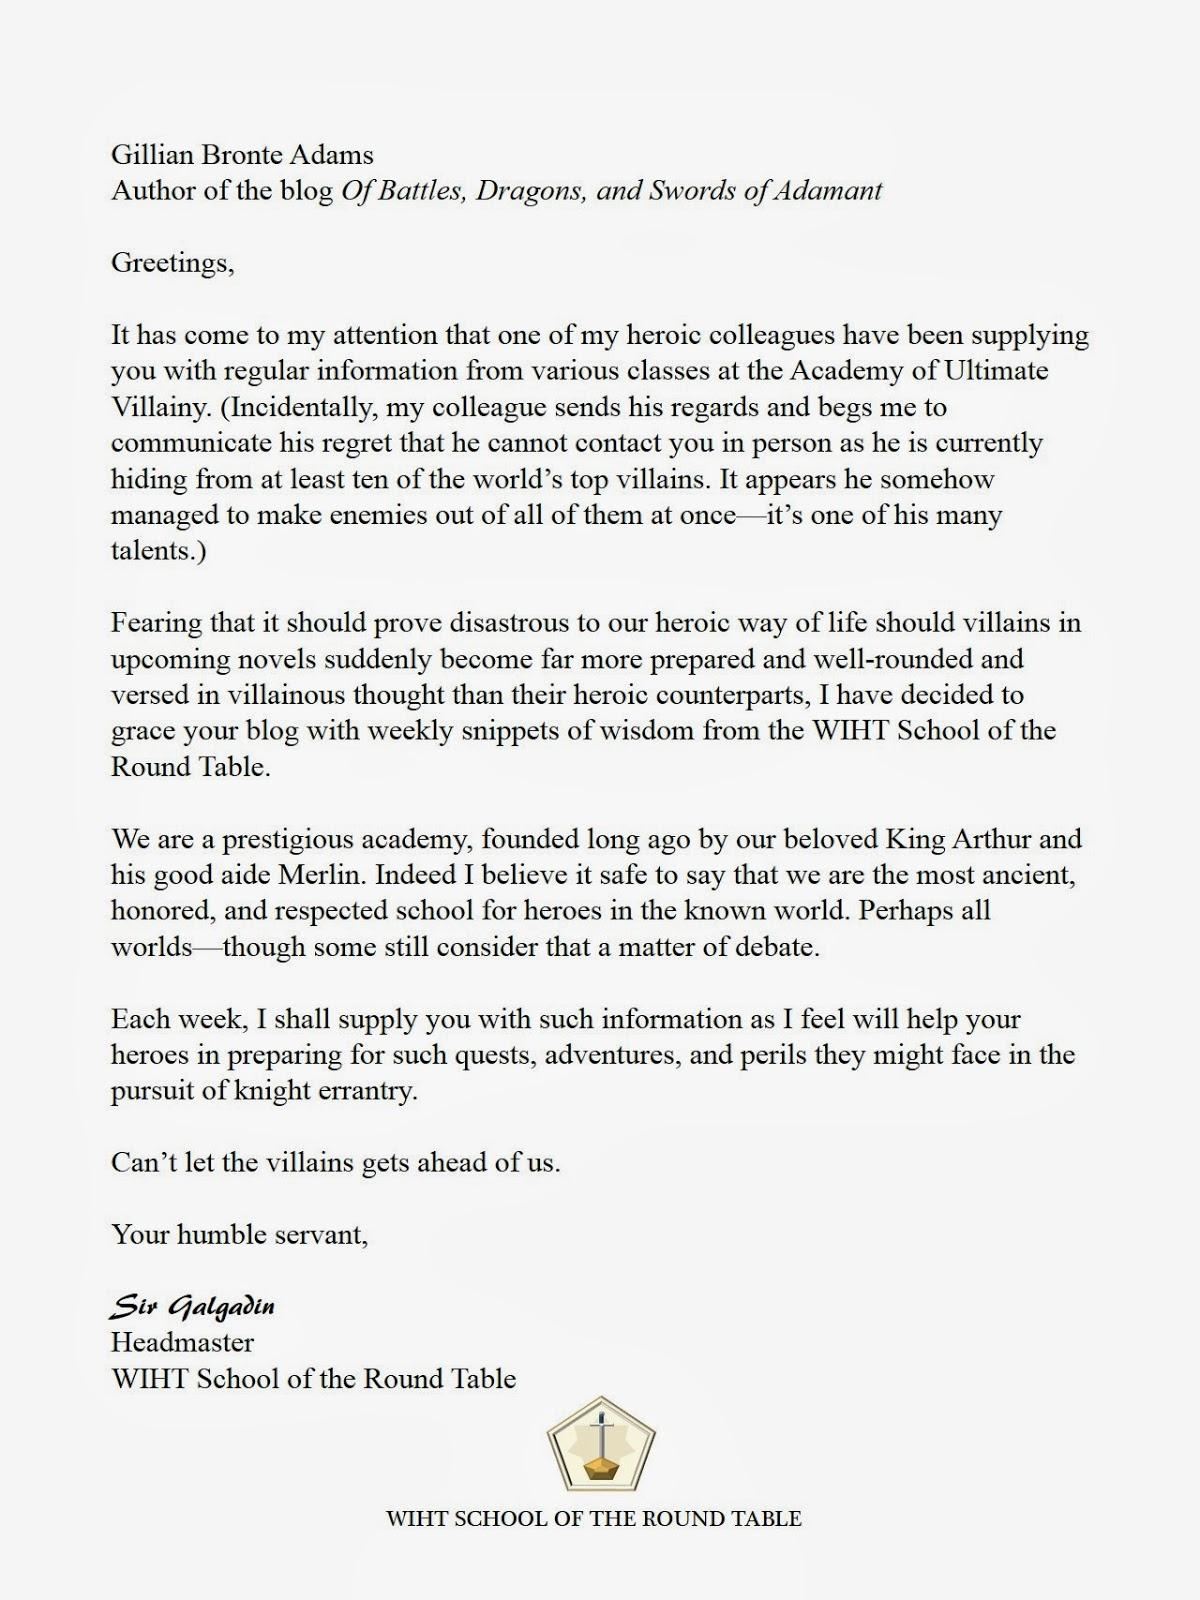 sample cover letter email cover letter sample cold